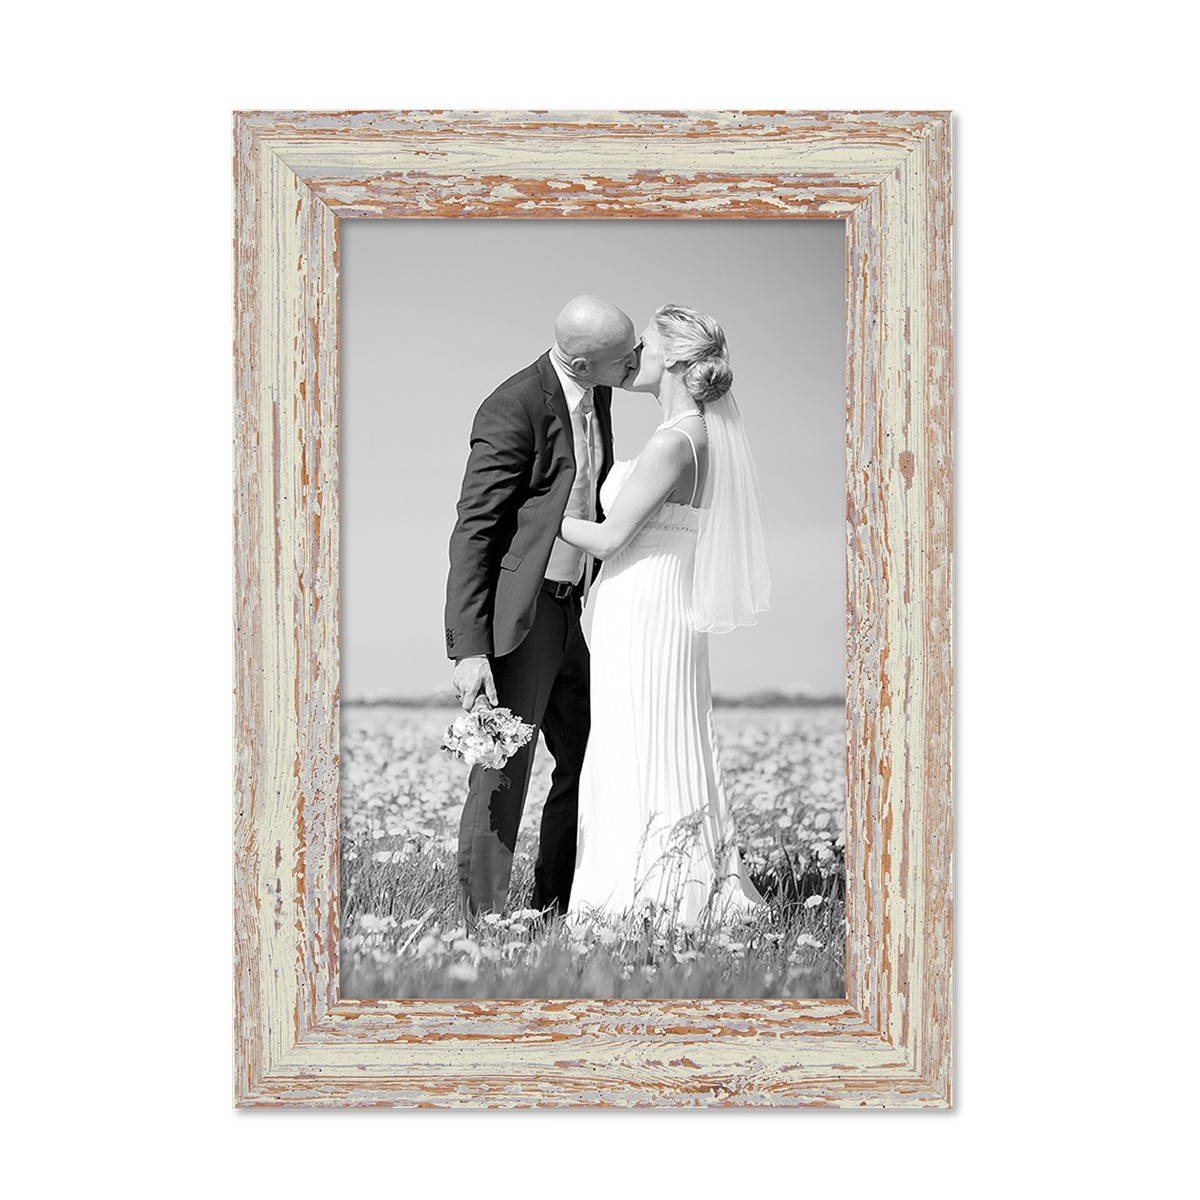 Bilderrahmen 18x24 cm Weiss Shabby-Chic Vintage Massivholz mit ...